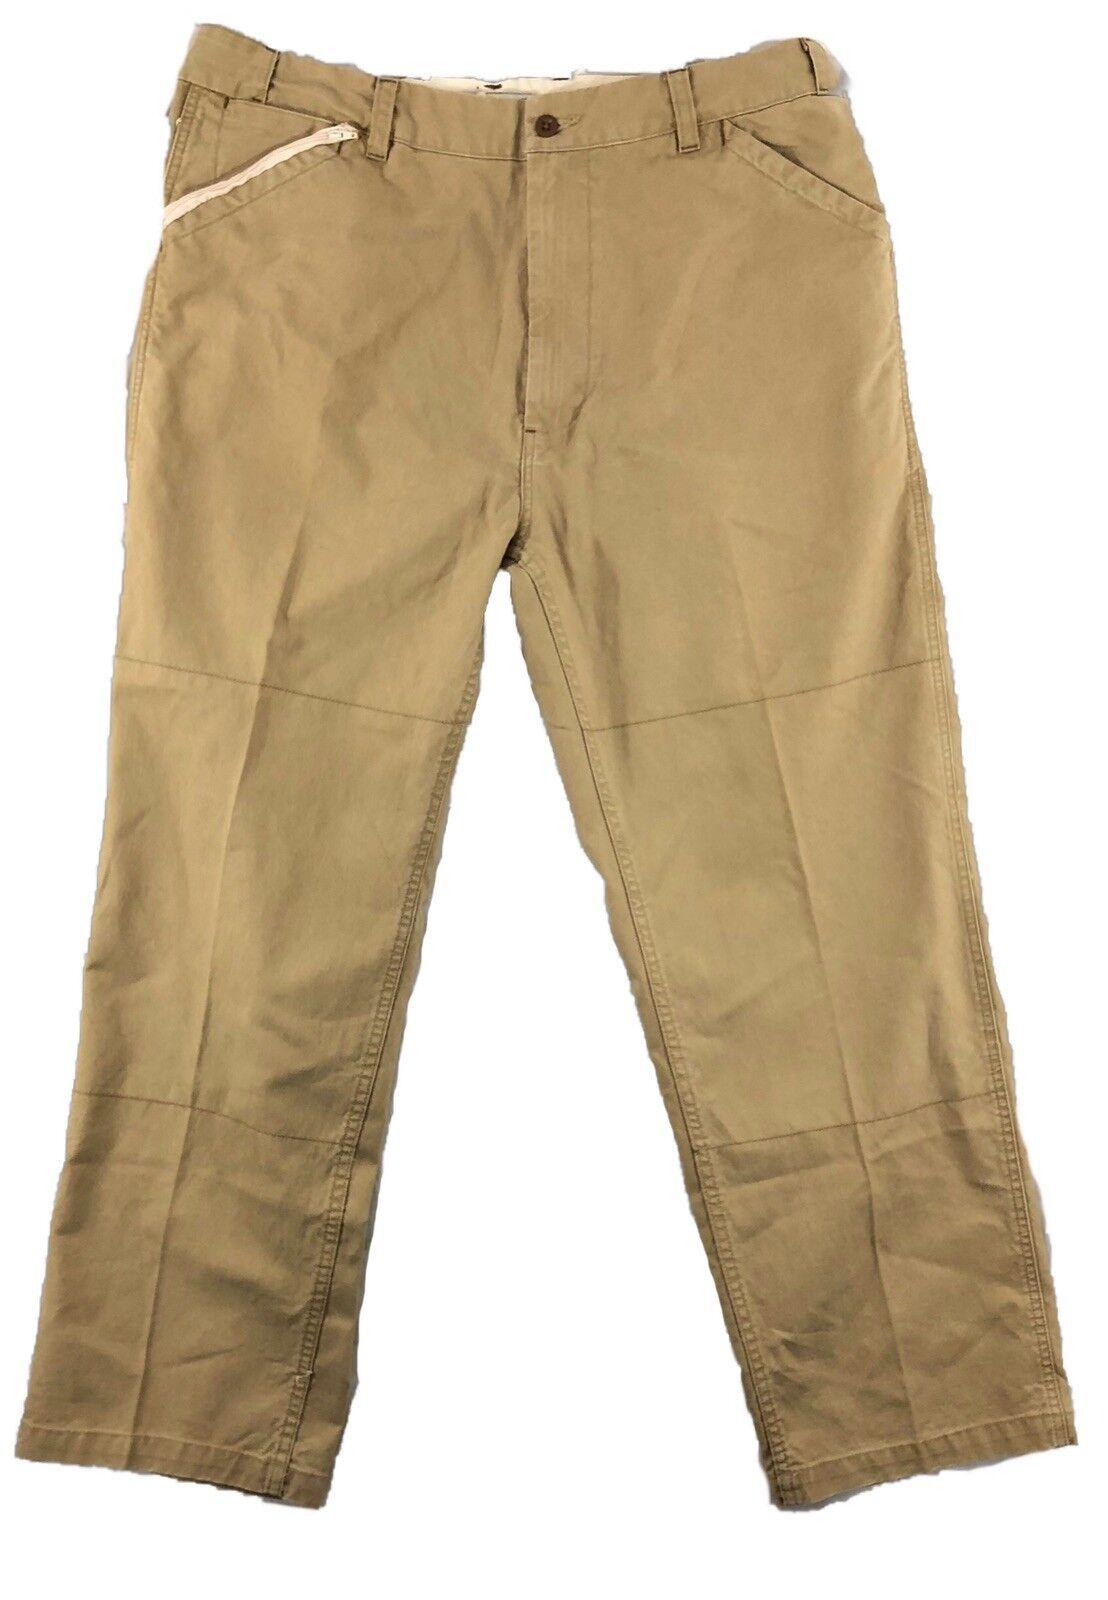 Polo Jeans Co Ralph Lauren Men's Tan Military Trouser Pants 38 30